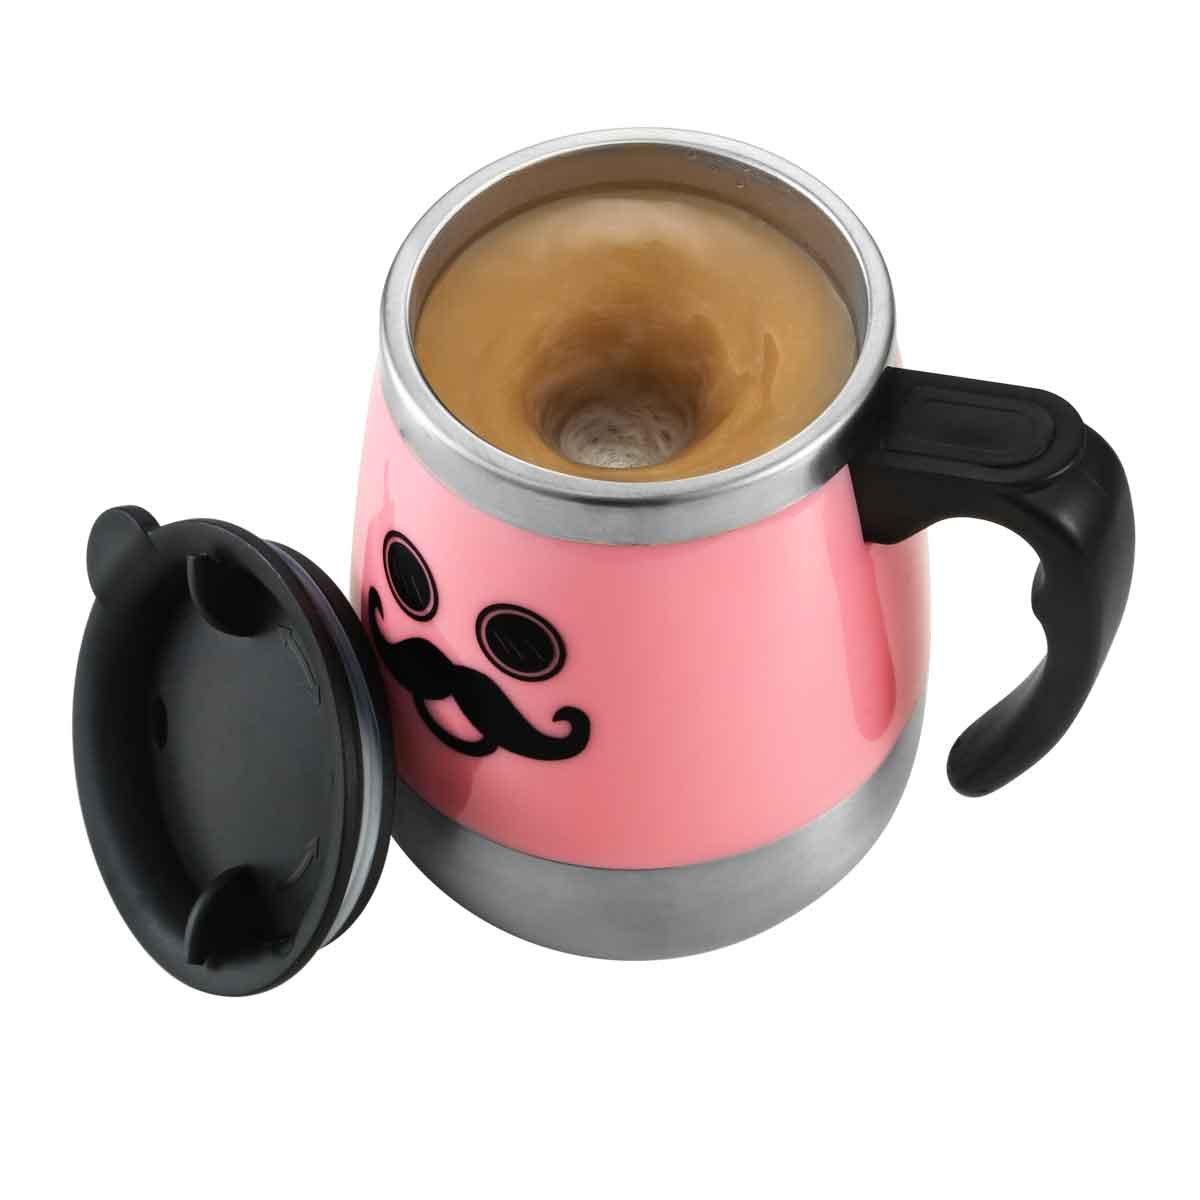 LEADNOVO Self Stirring Stainless Steel Mug 450ml/15.2oz Pink by LEADNOVO